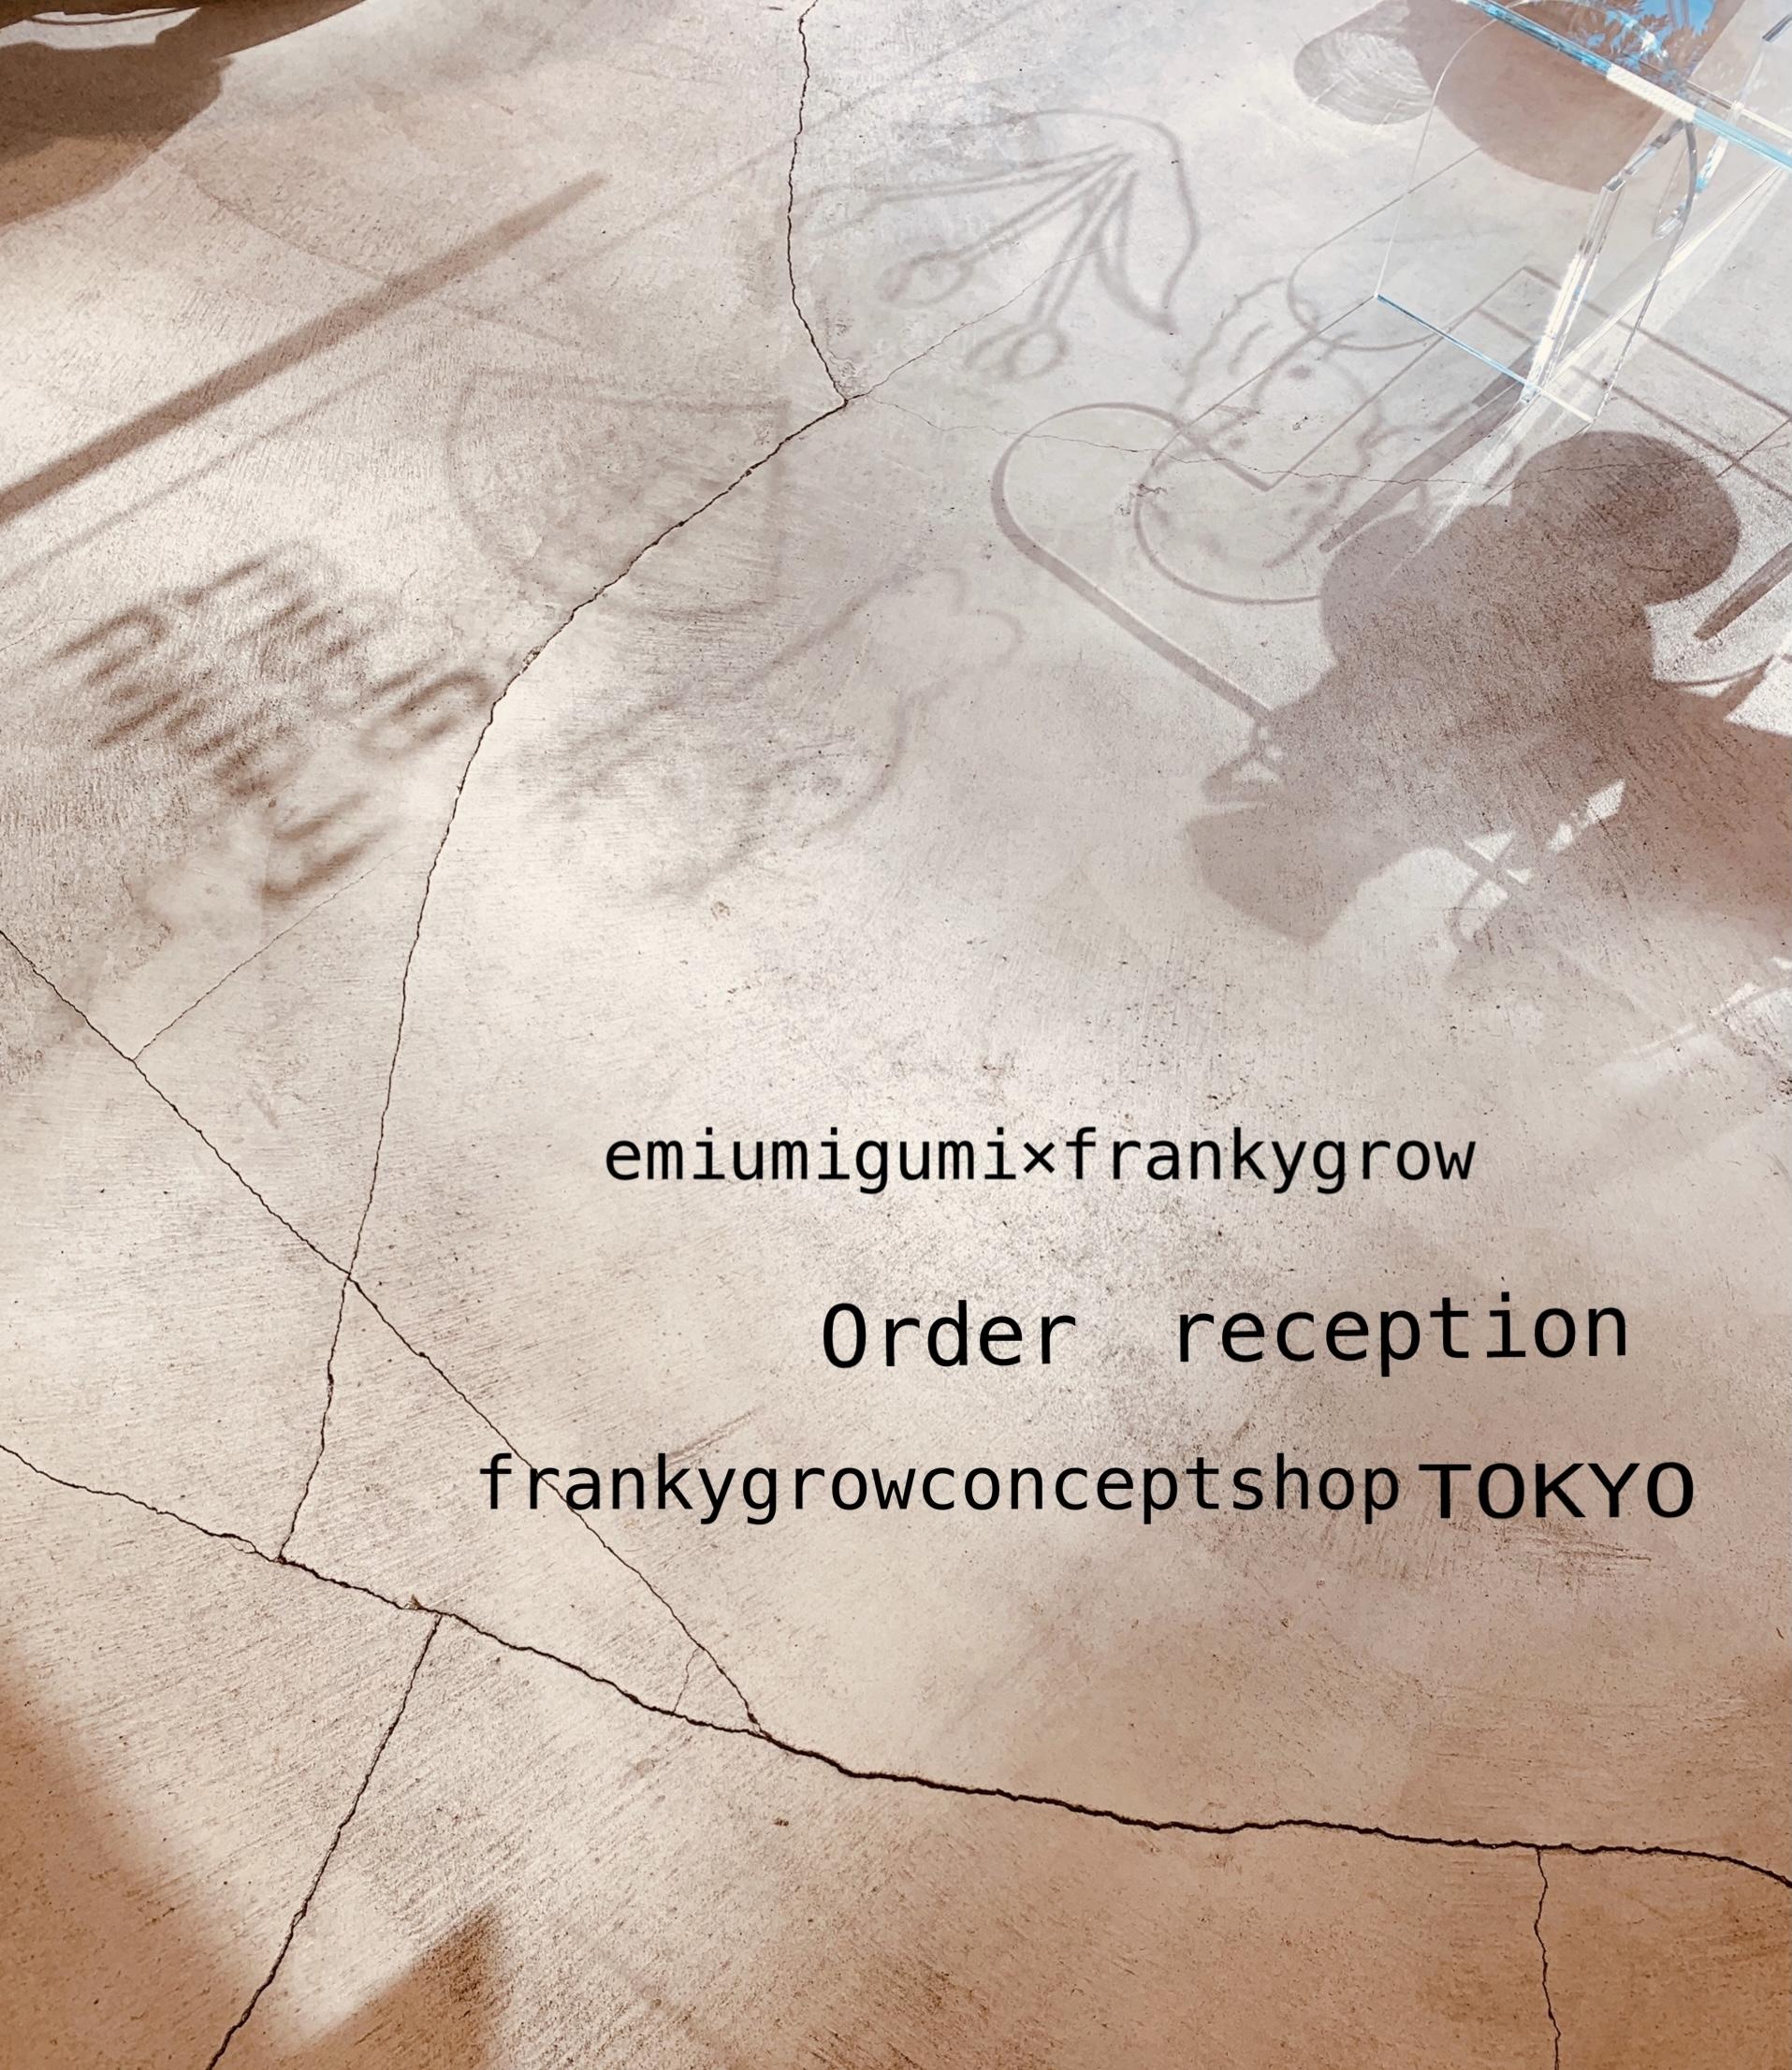 emiumigumi × frankygrow vol.4